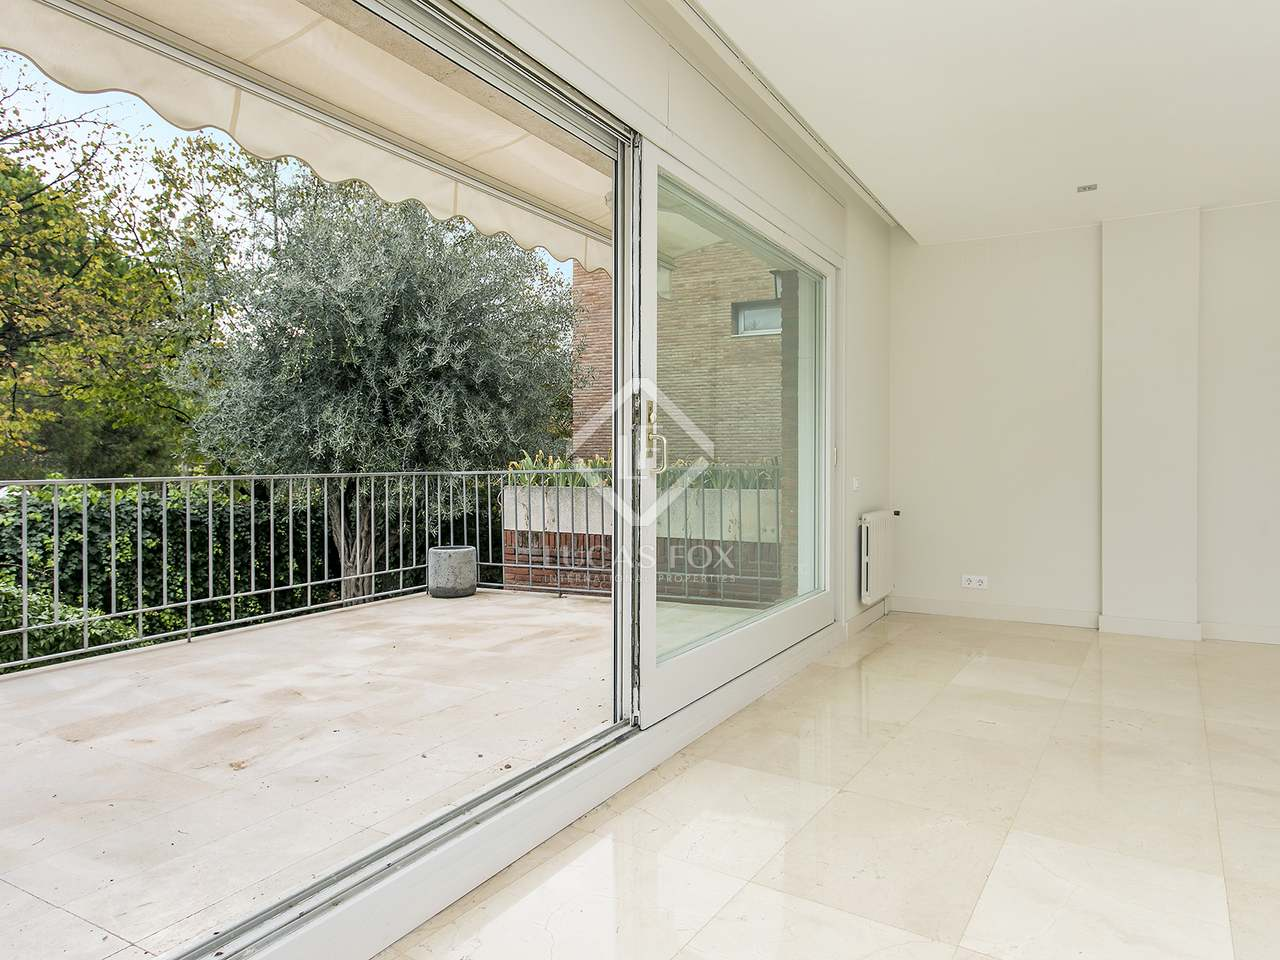 Casa de 390 m con jard n en alquiler en pedralbes for Alquiler casa con jardin barcelona